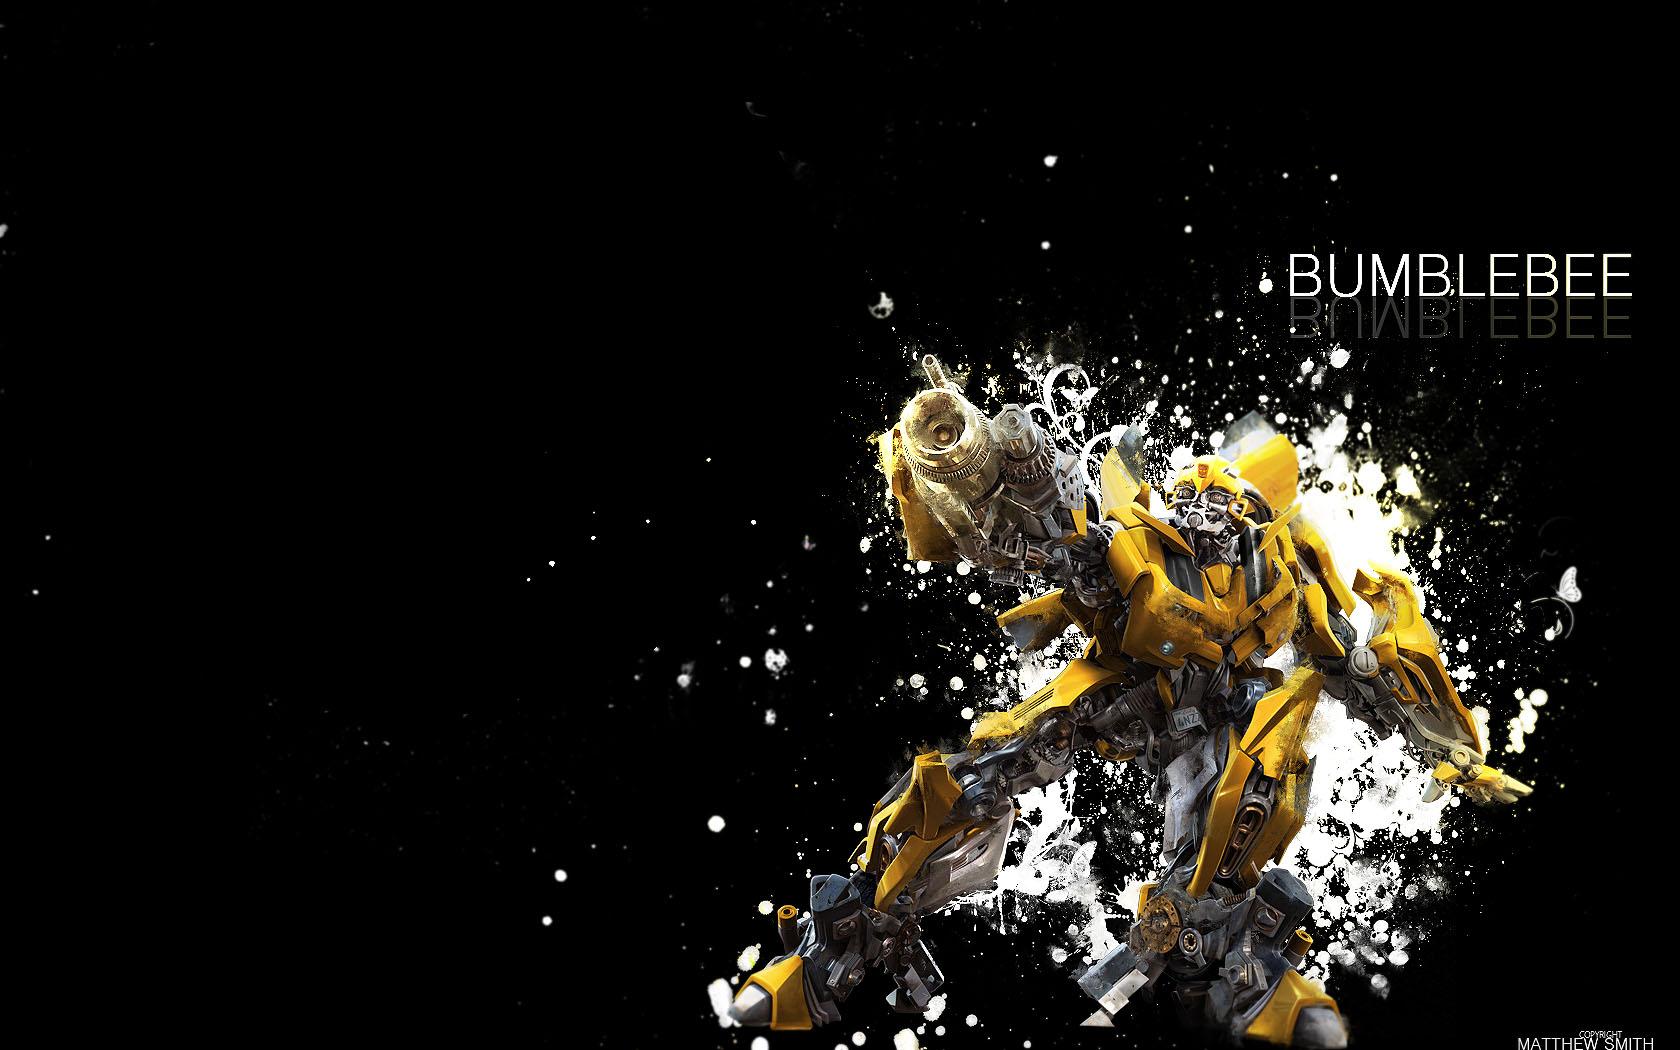 bumblebee wallpaper 2 1680x050 by unique2892 fan art wallpaper movies 1680x1050